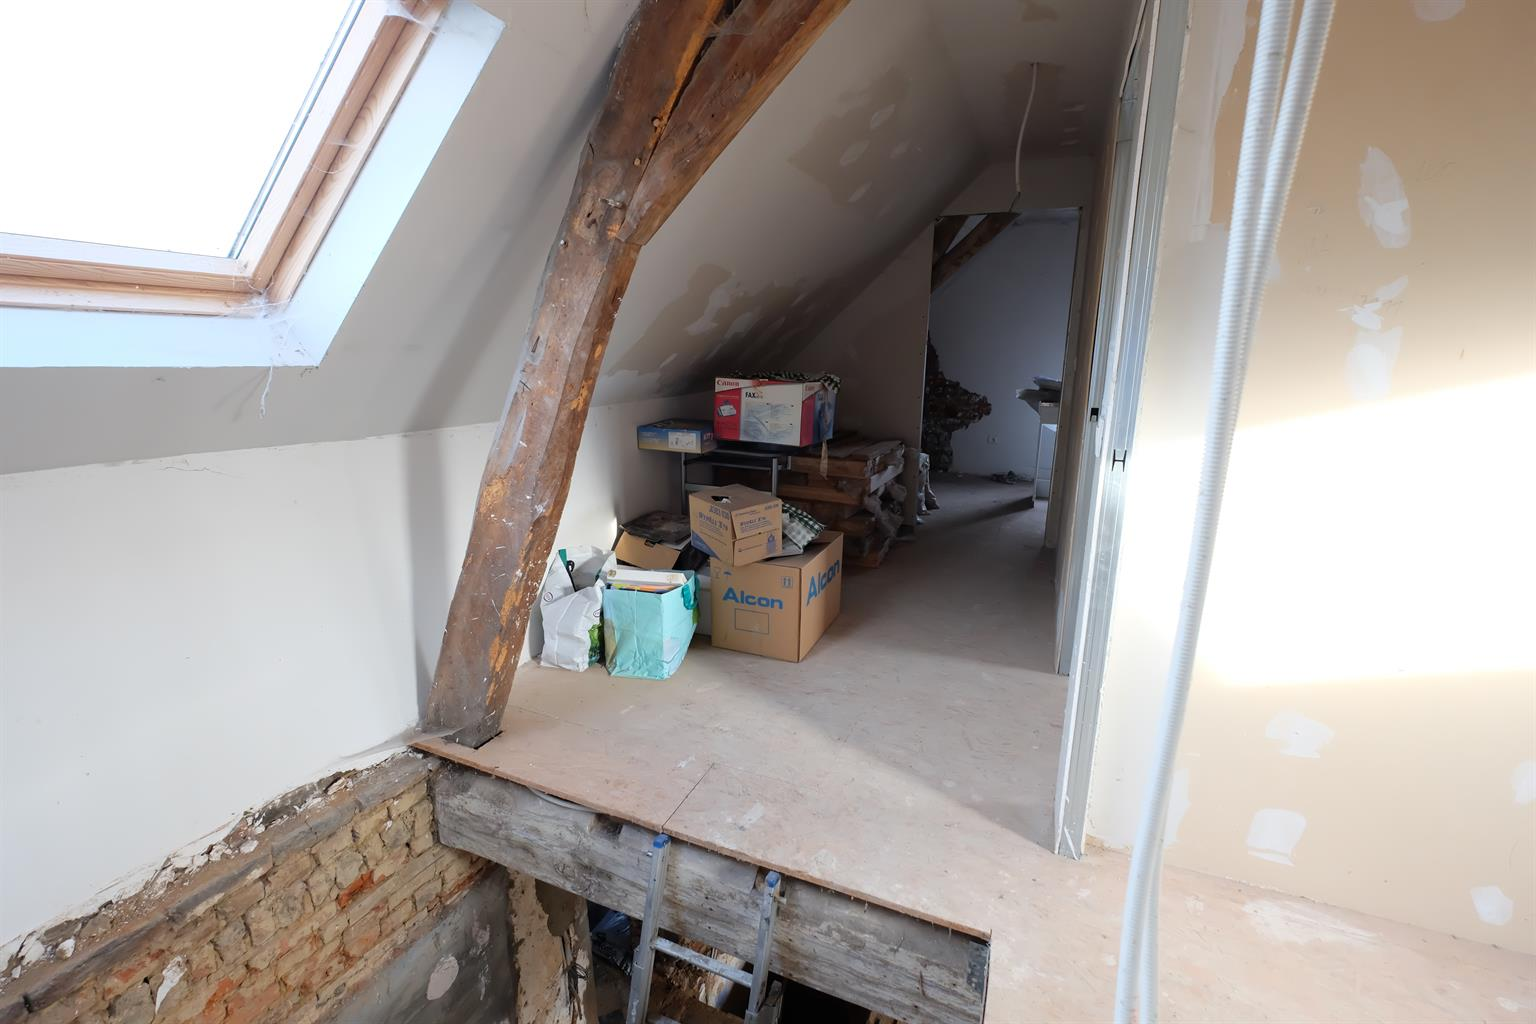 Maison - Tubize Oisquercq - #4500506-3